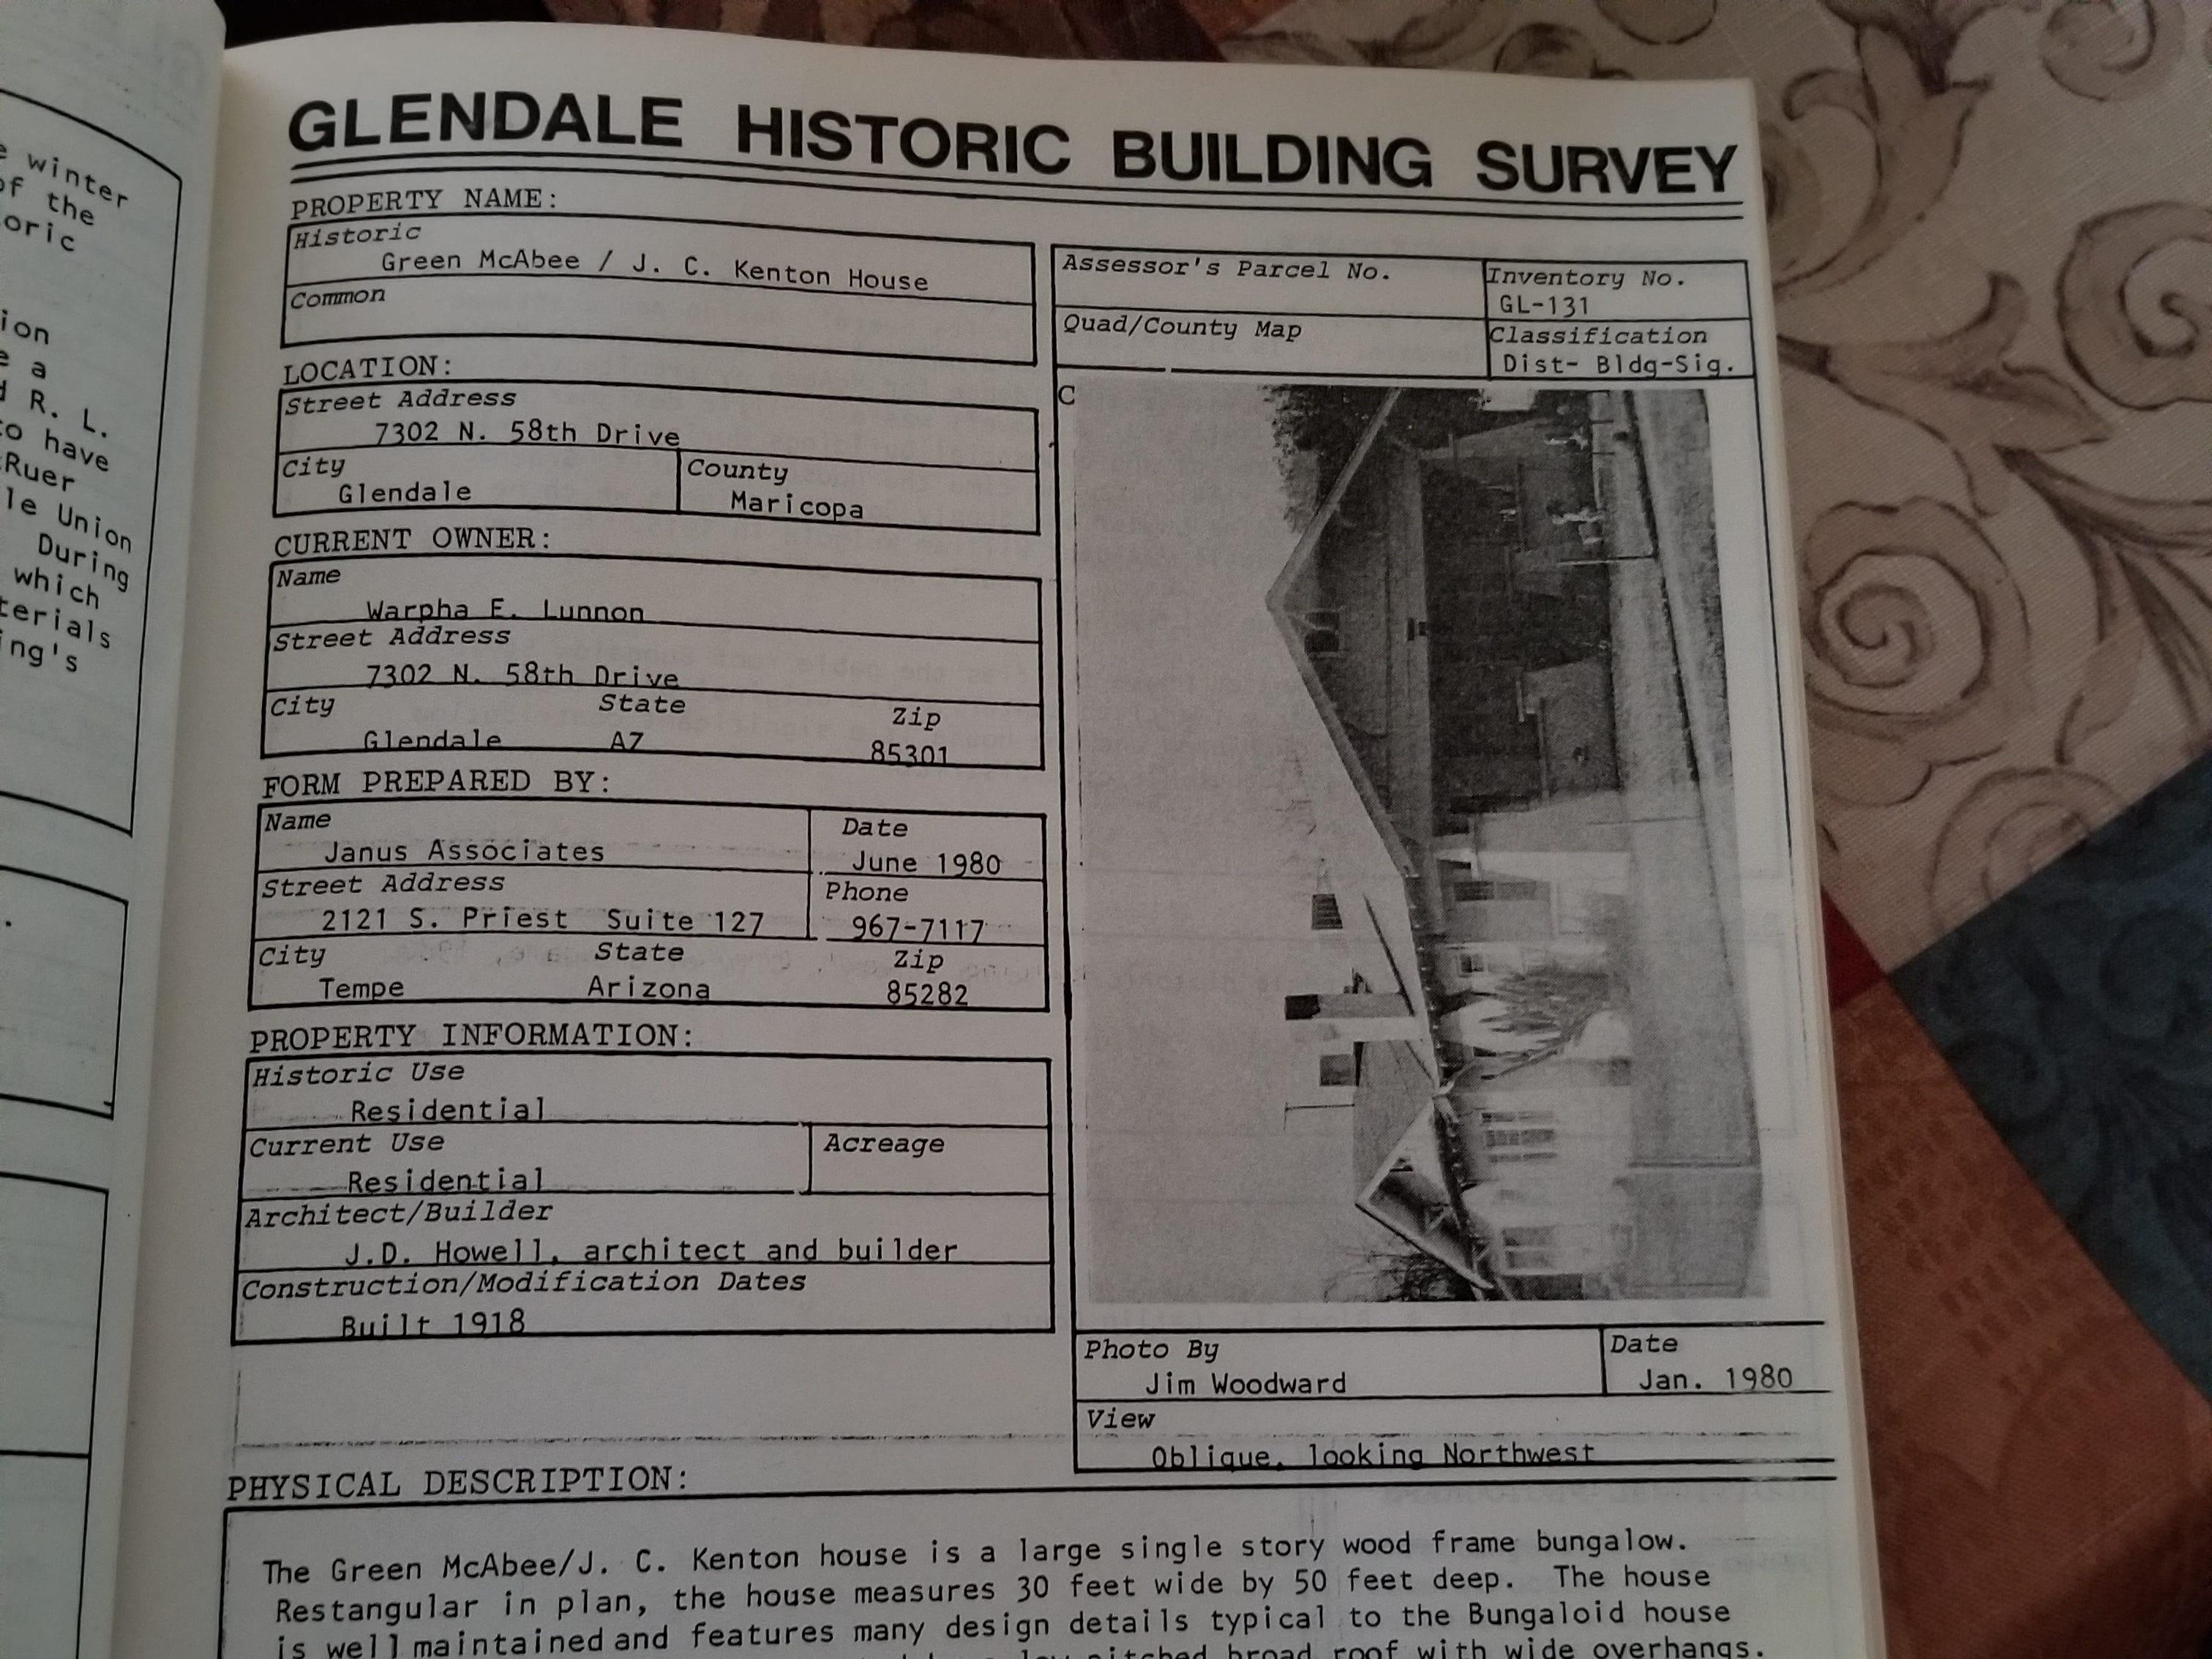 The Glendale Historic Building Survey circa 1980 describes the home Green-McAbee house.